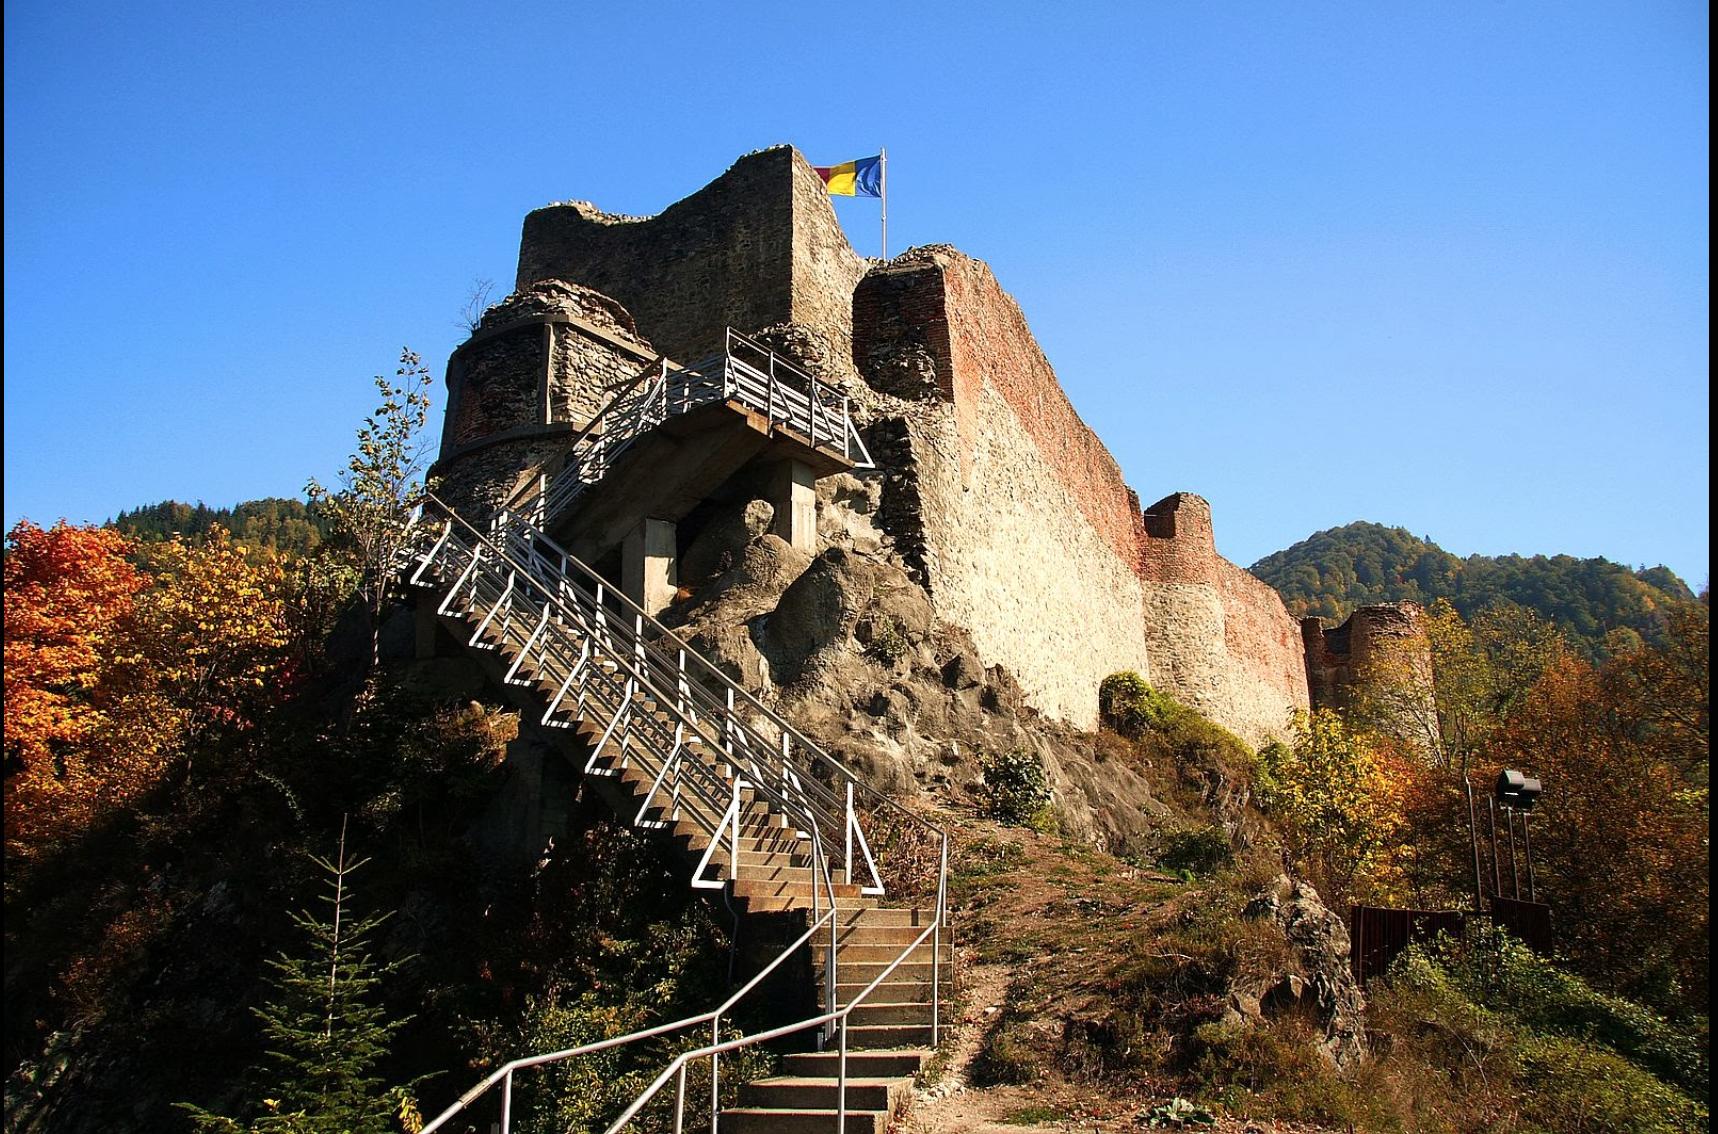 Vlad III's actual castle. http://www.aeolus13umbra.com/2013/10/vlad-dracula-dragons-shadow-balkan.html